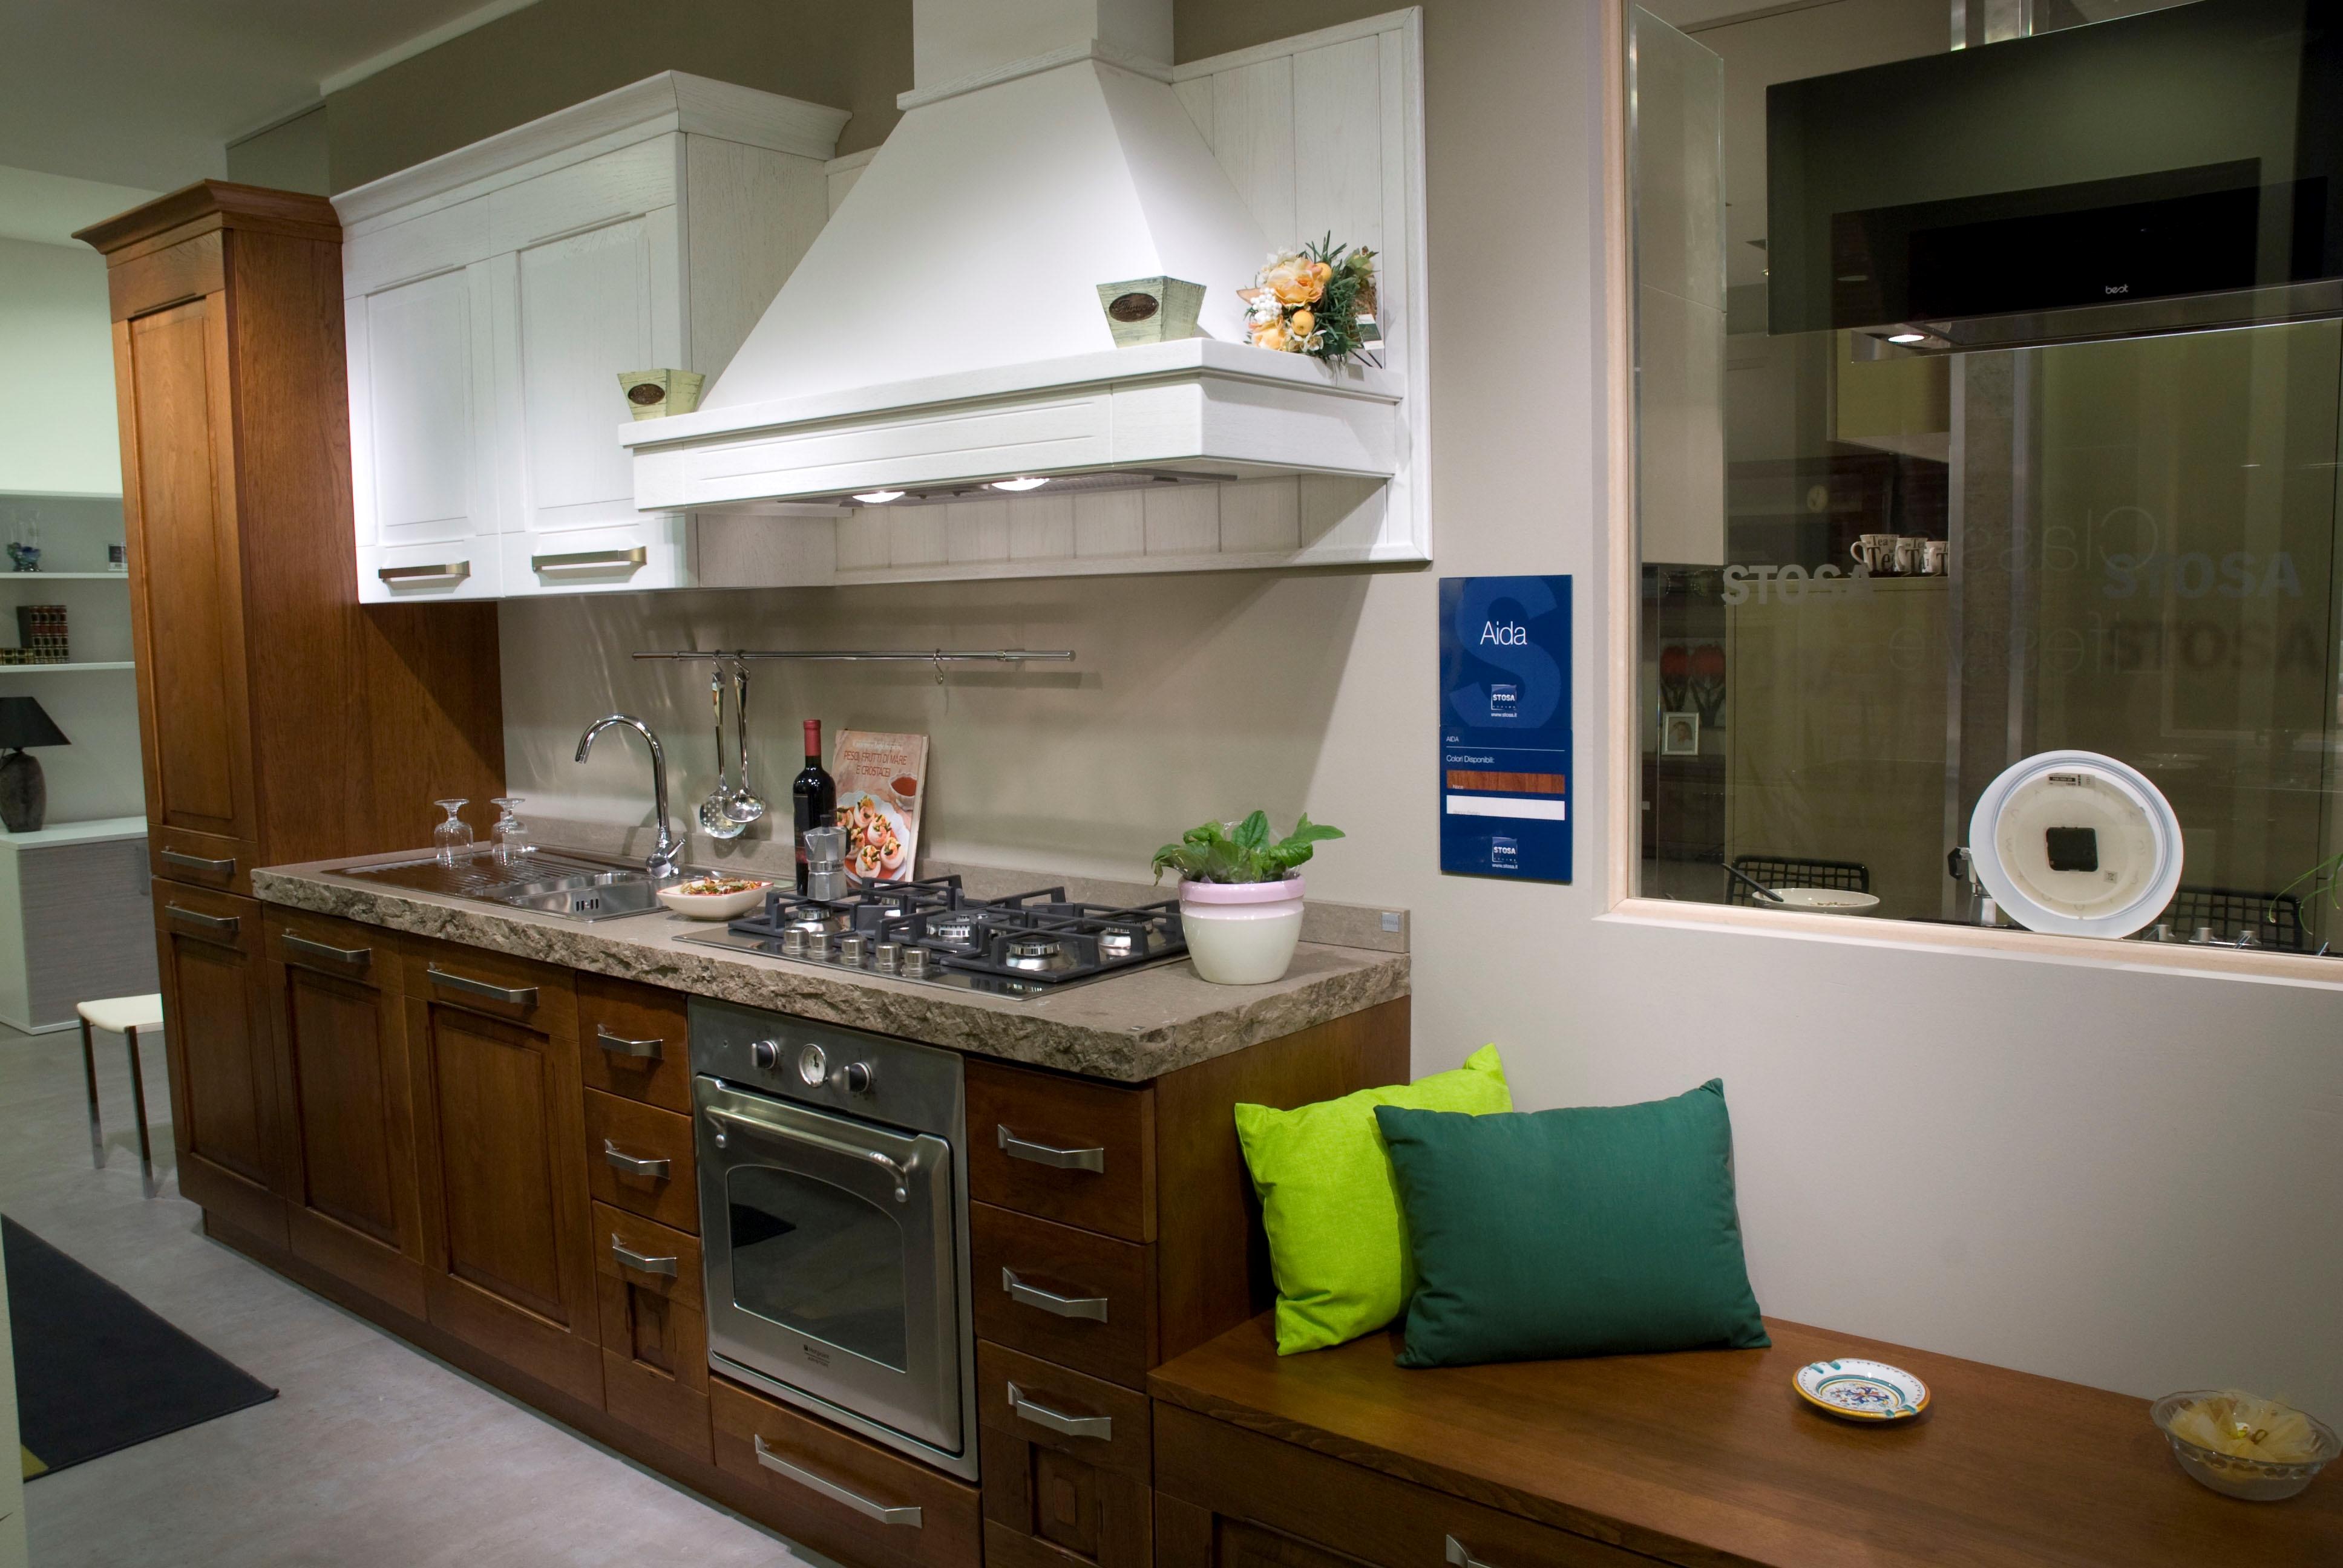 Stosa cucine cucina aida scontato del 67 cucine a for Cucine stosa